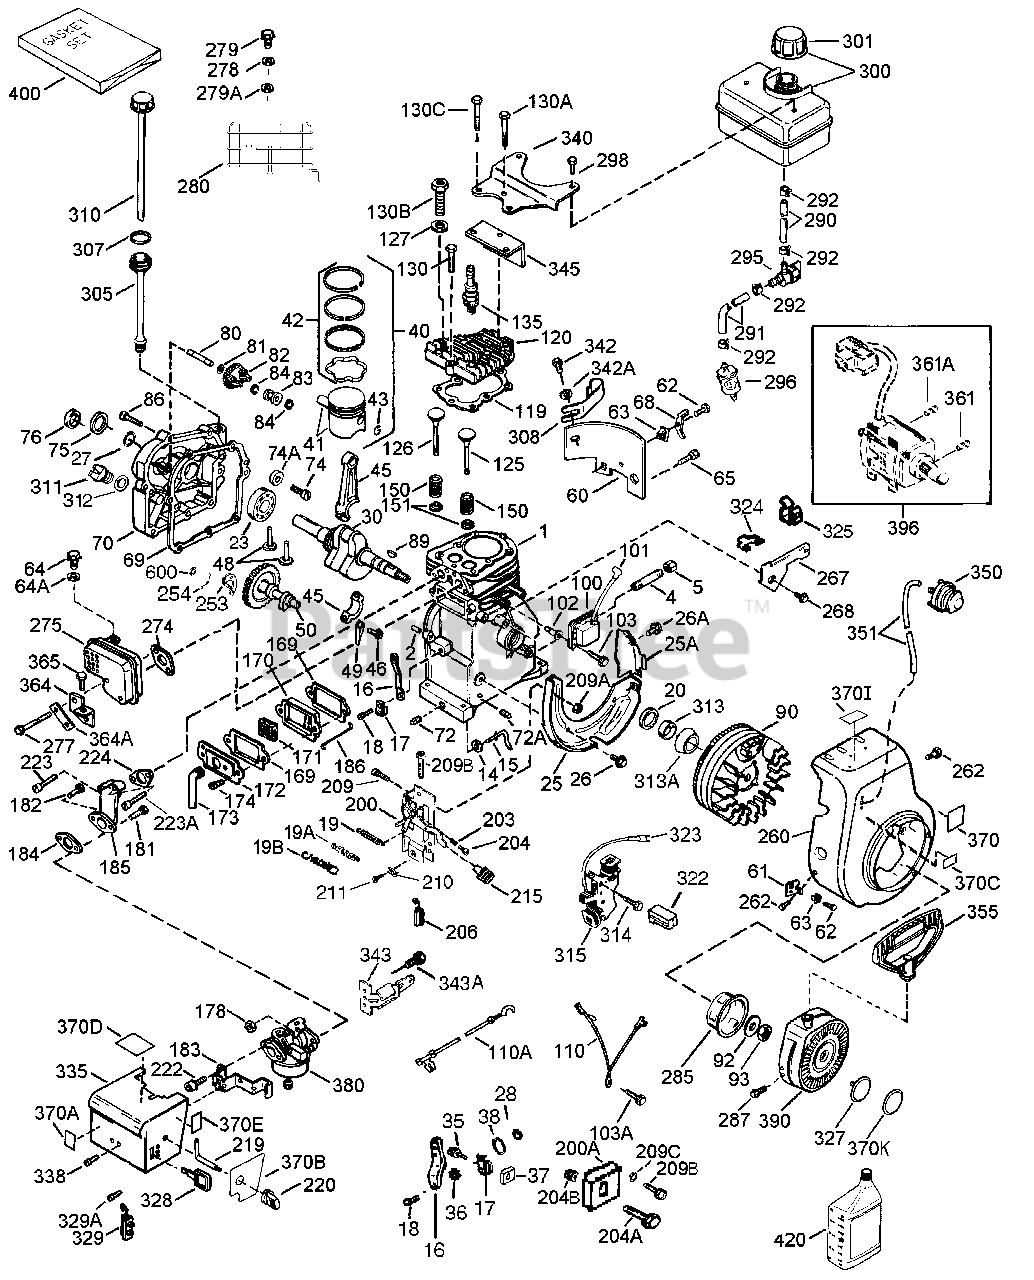 Tecumseh HSSK50-67388S - Tecumseh Engine Engine Parts List Parts Lookup  with Diagrams | PartsTreePartsTree